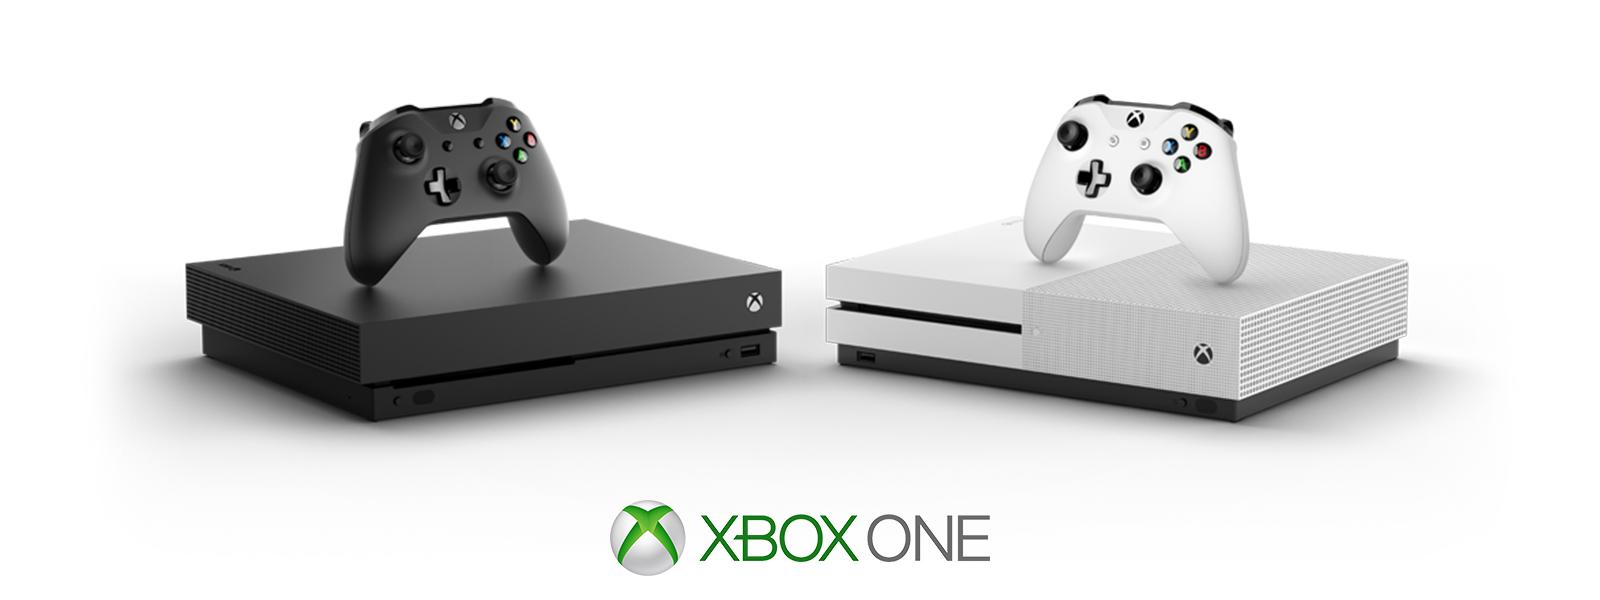 Xbox One X ve Xbox One S